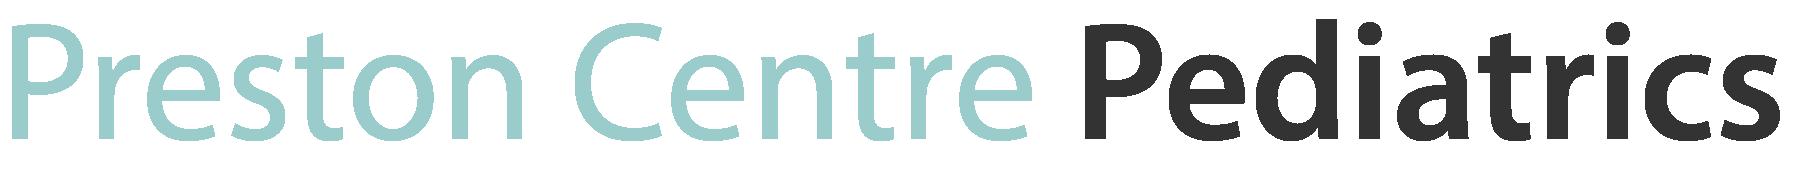 Preston Centre Pediatrics – Health Wellness Friendly Caring